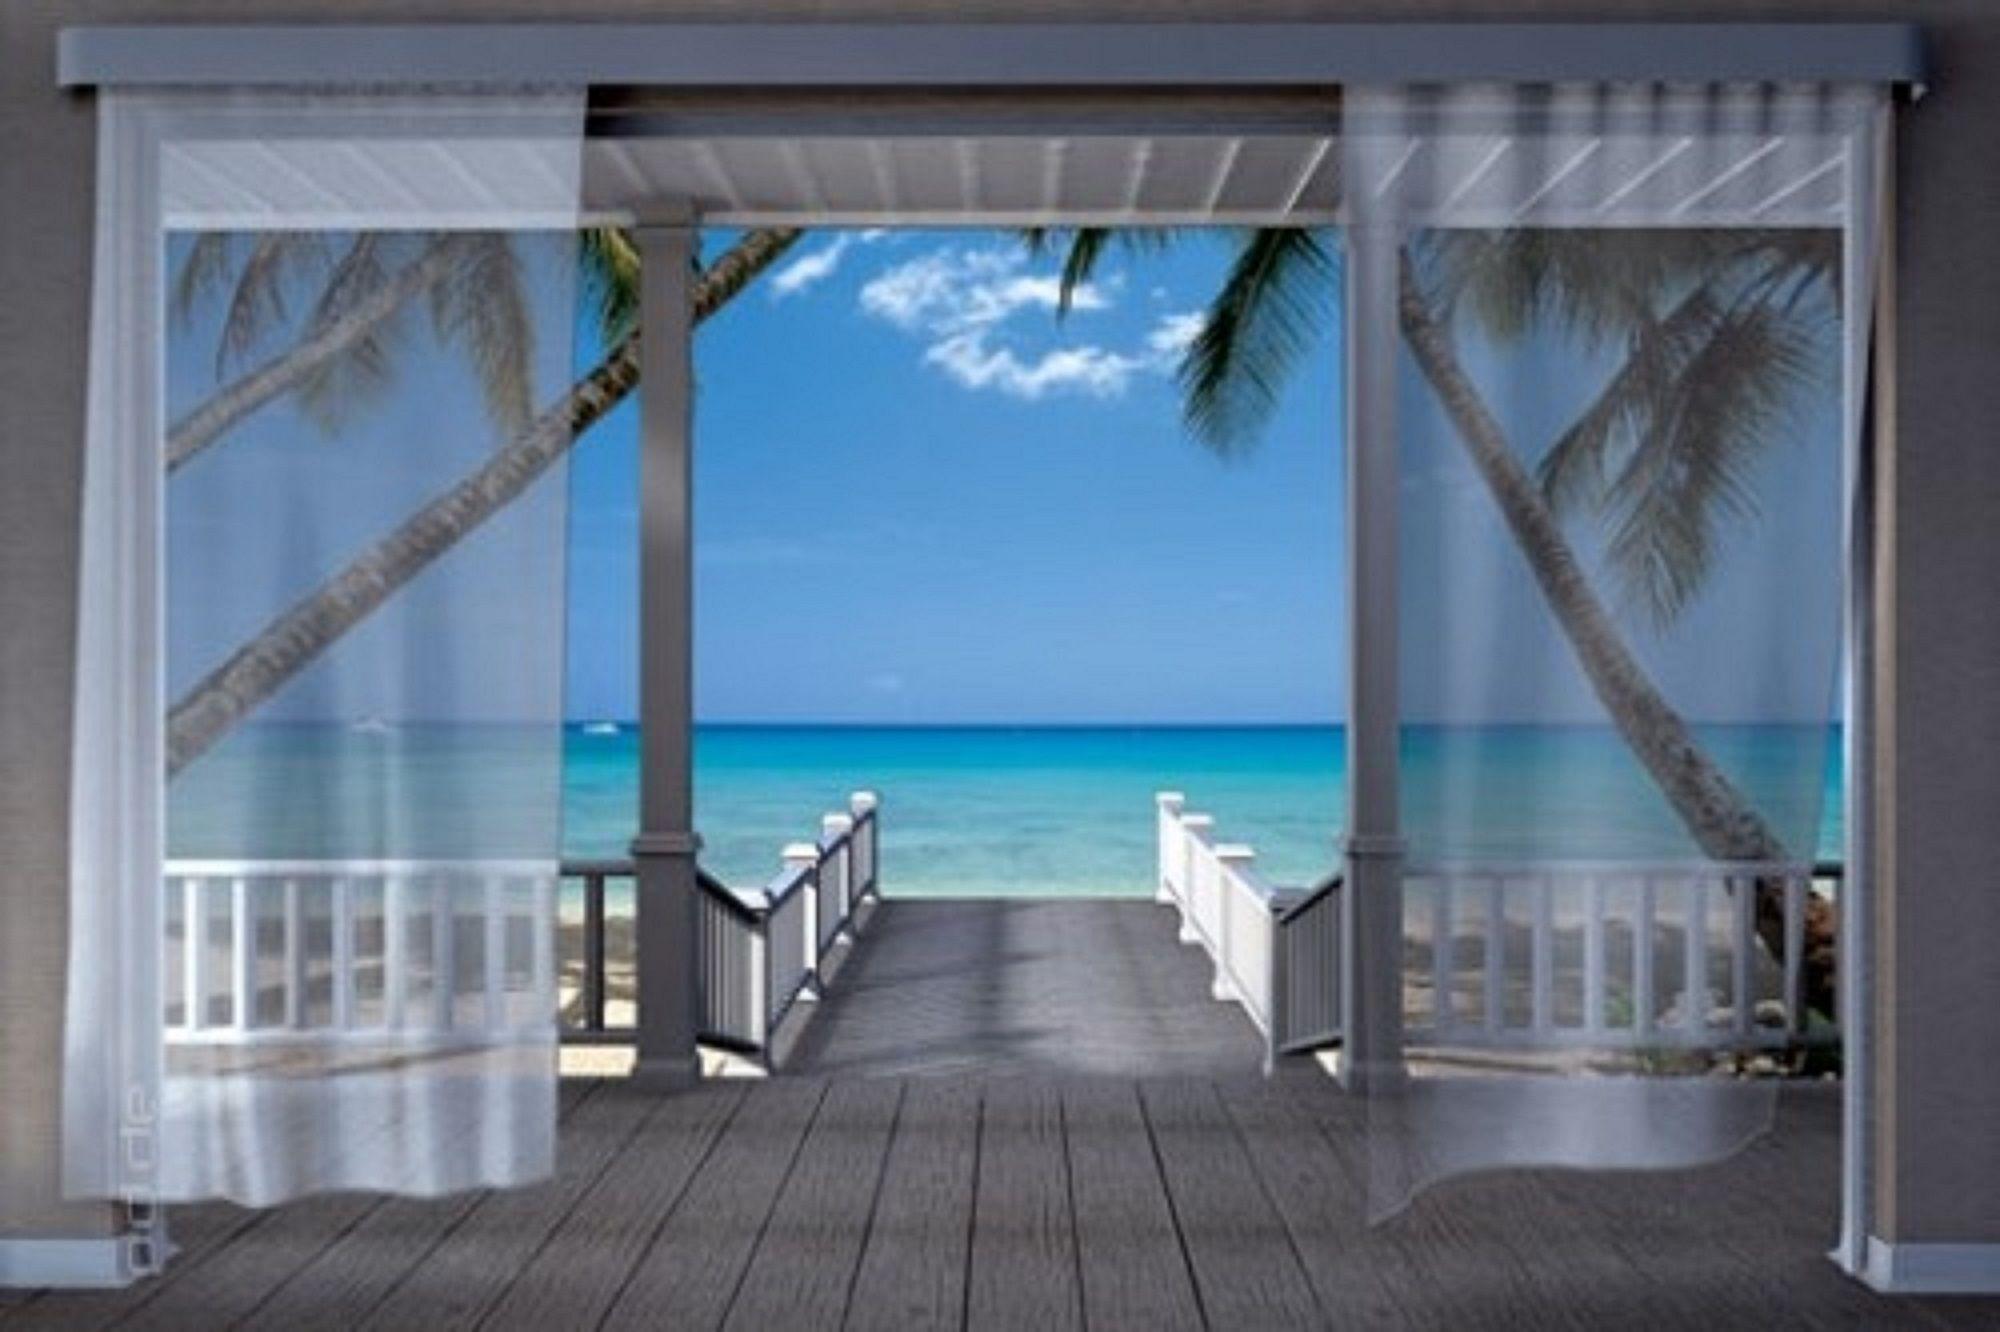 Kuhle Startseite Dekoration Designe Fototapete Meerblick Veranda #18: Fototapete Fenster Zum Meer - Google-Suche